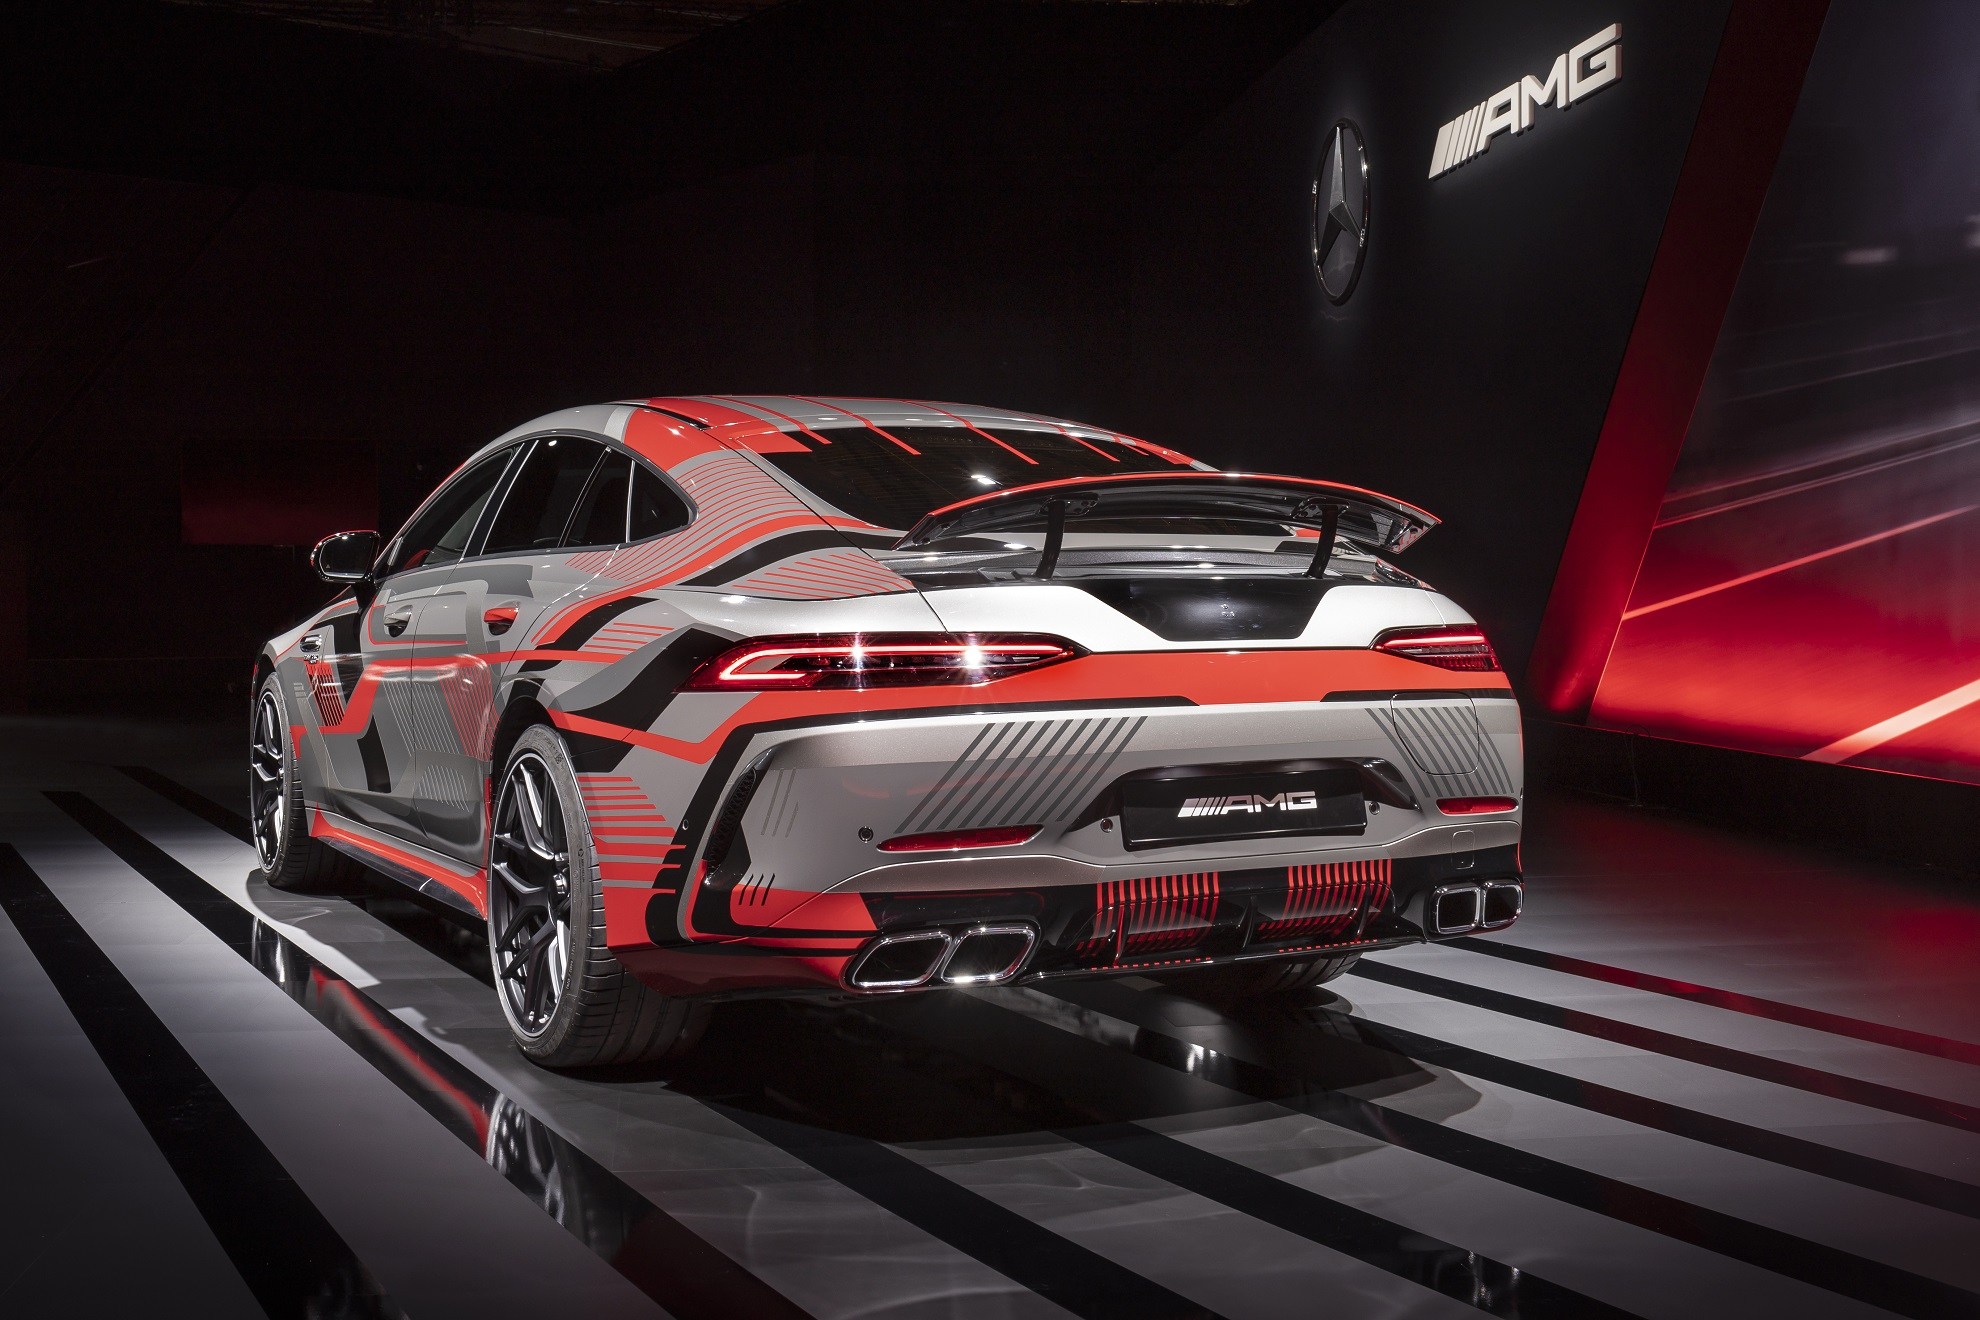 TecDAY AMG Future of Driving Performance Eigenständige E PERFORMANCE Antriebsstrategie für Performance-Hybride TecDAY AMG Future of Driving PerformanceIndependent E PERFORMANCE drivetrain strategy for performance hybrids